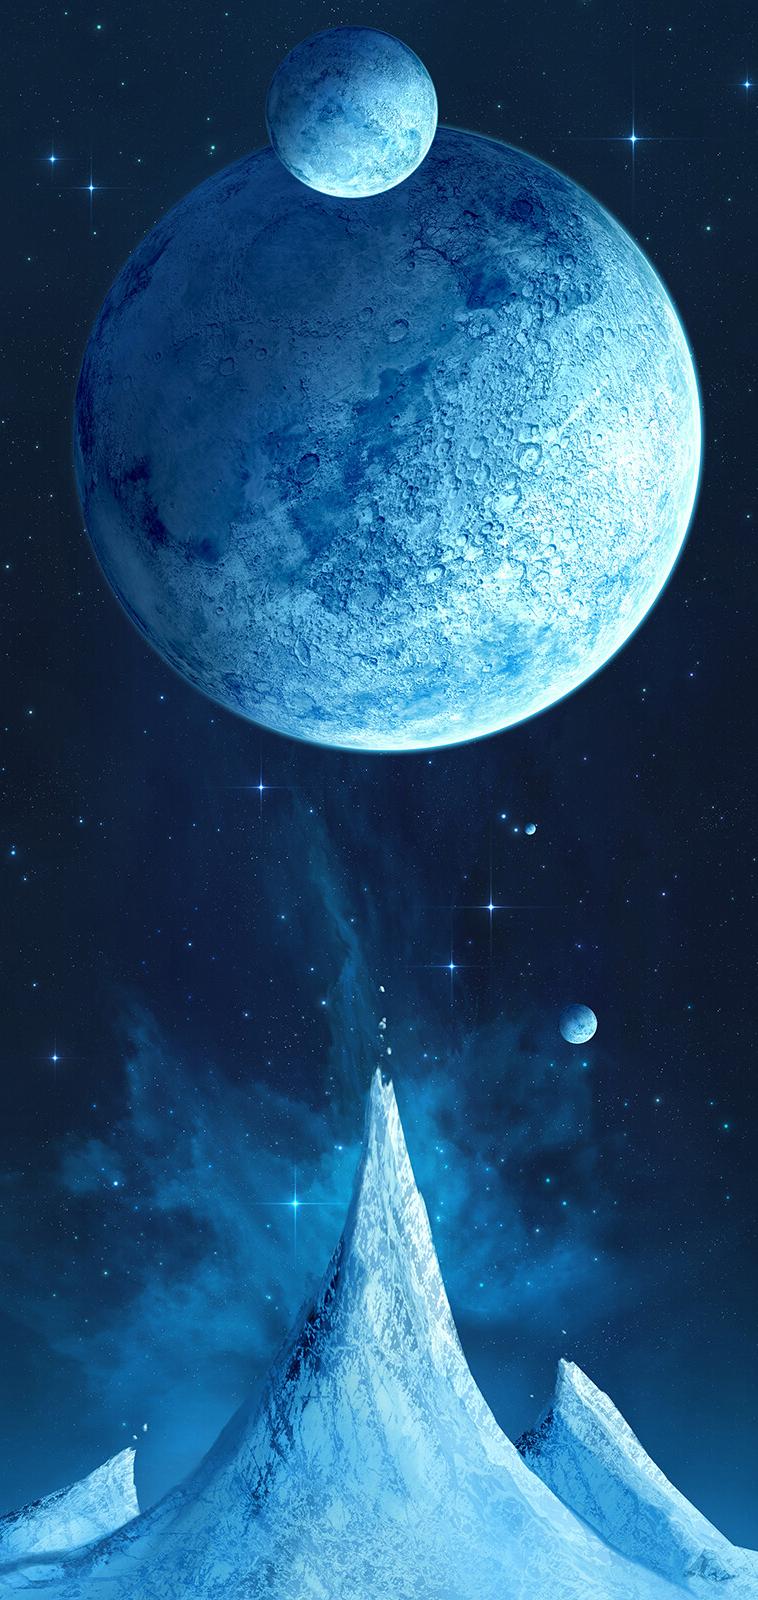 ice-world-planet-wallpaper-phone-hd